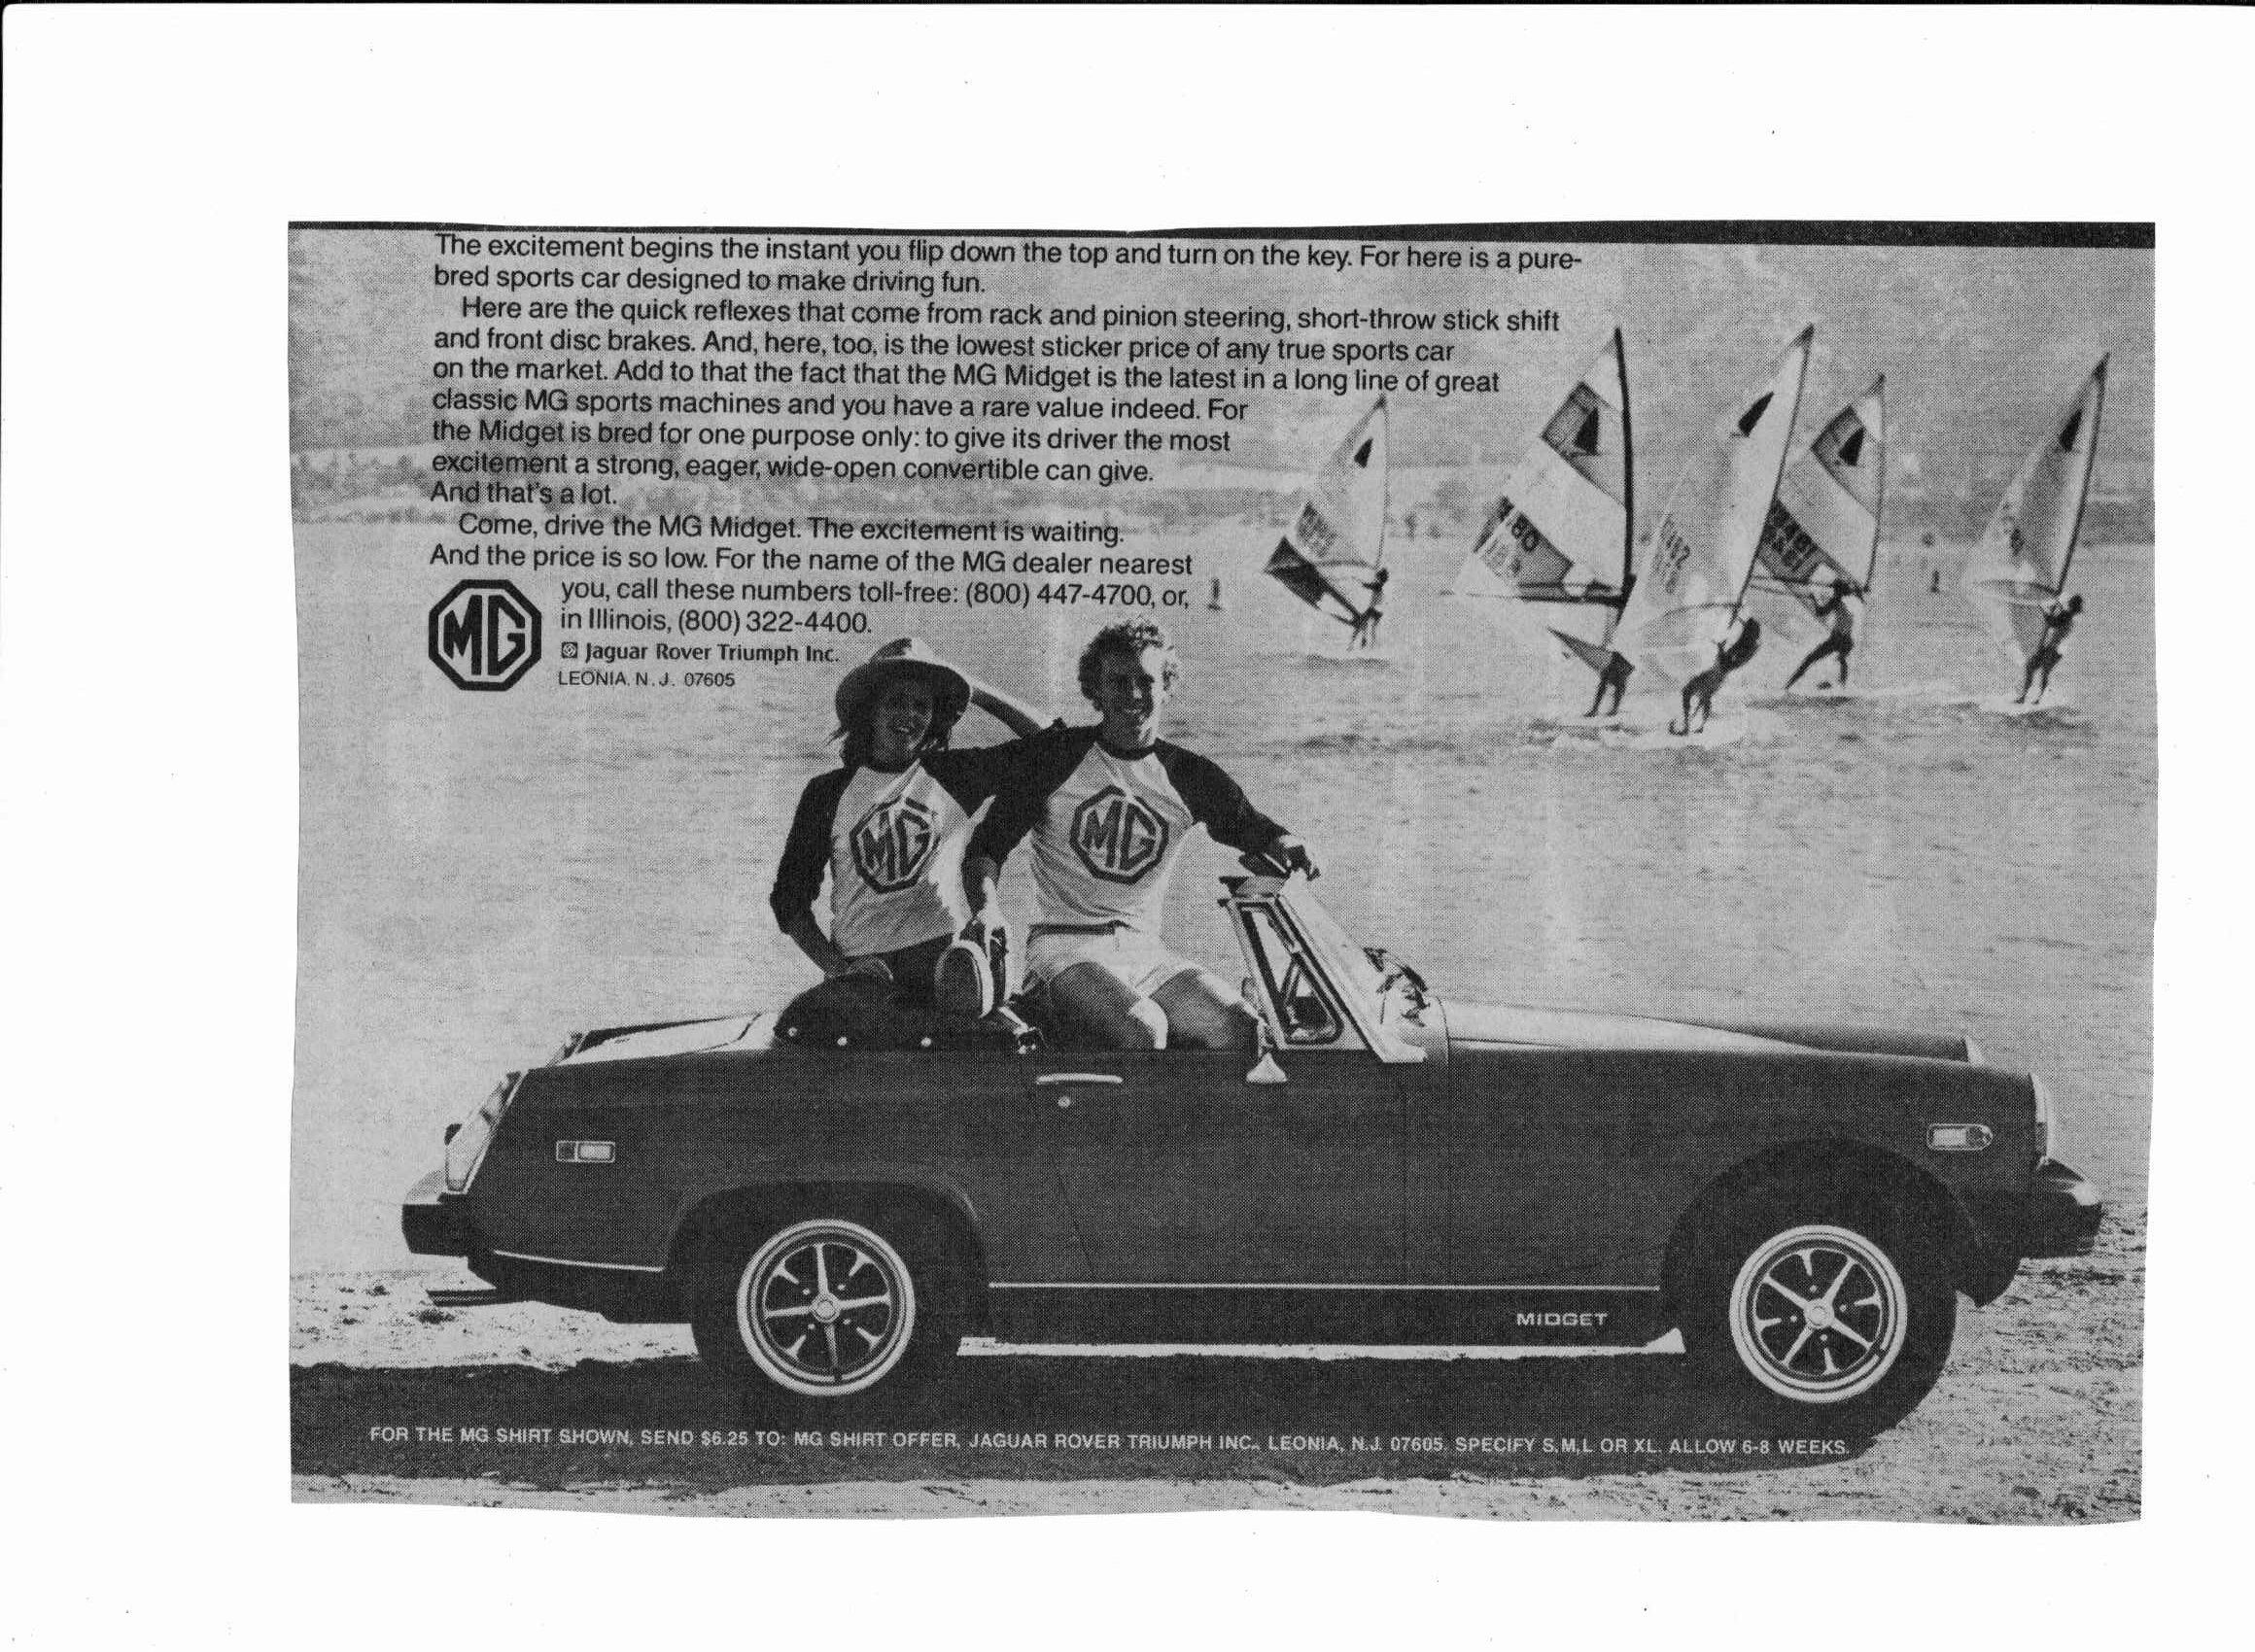 MG Midget TC 1946, one of three sales advertisings